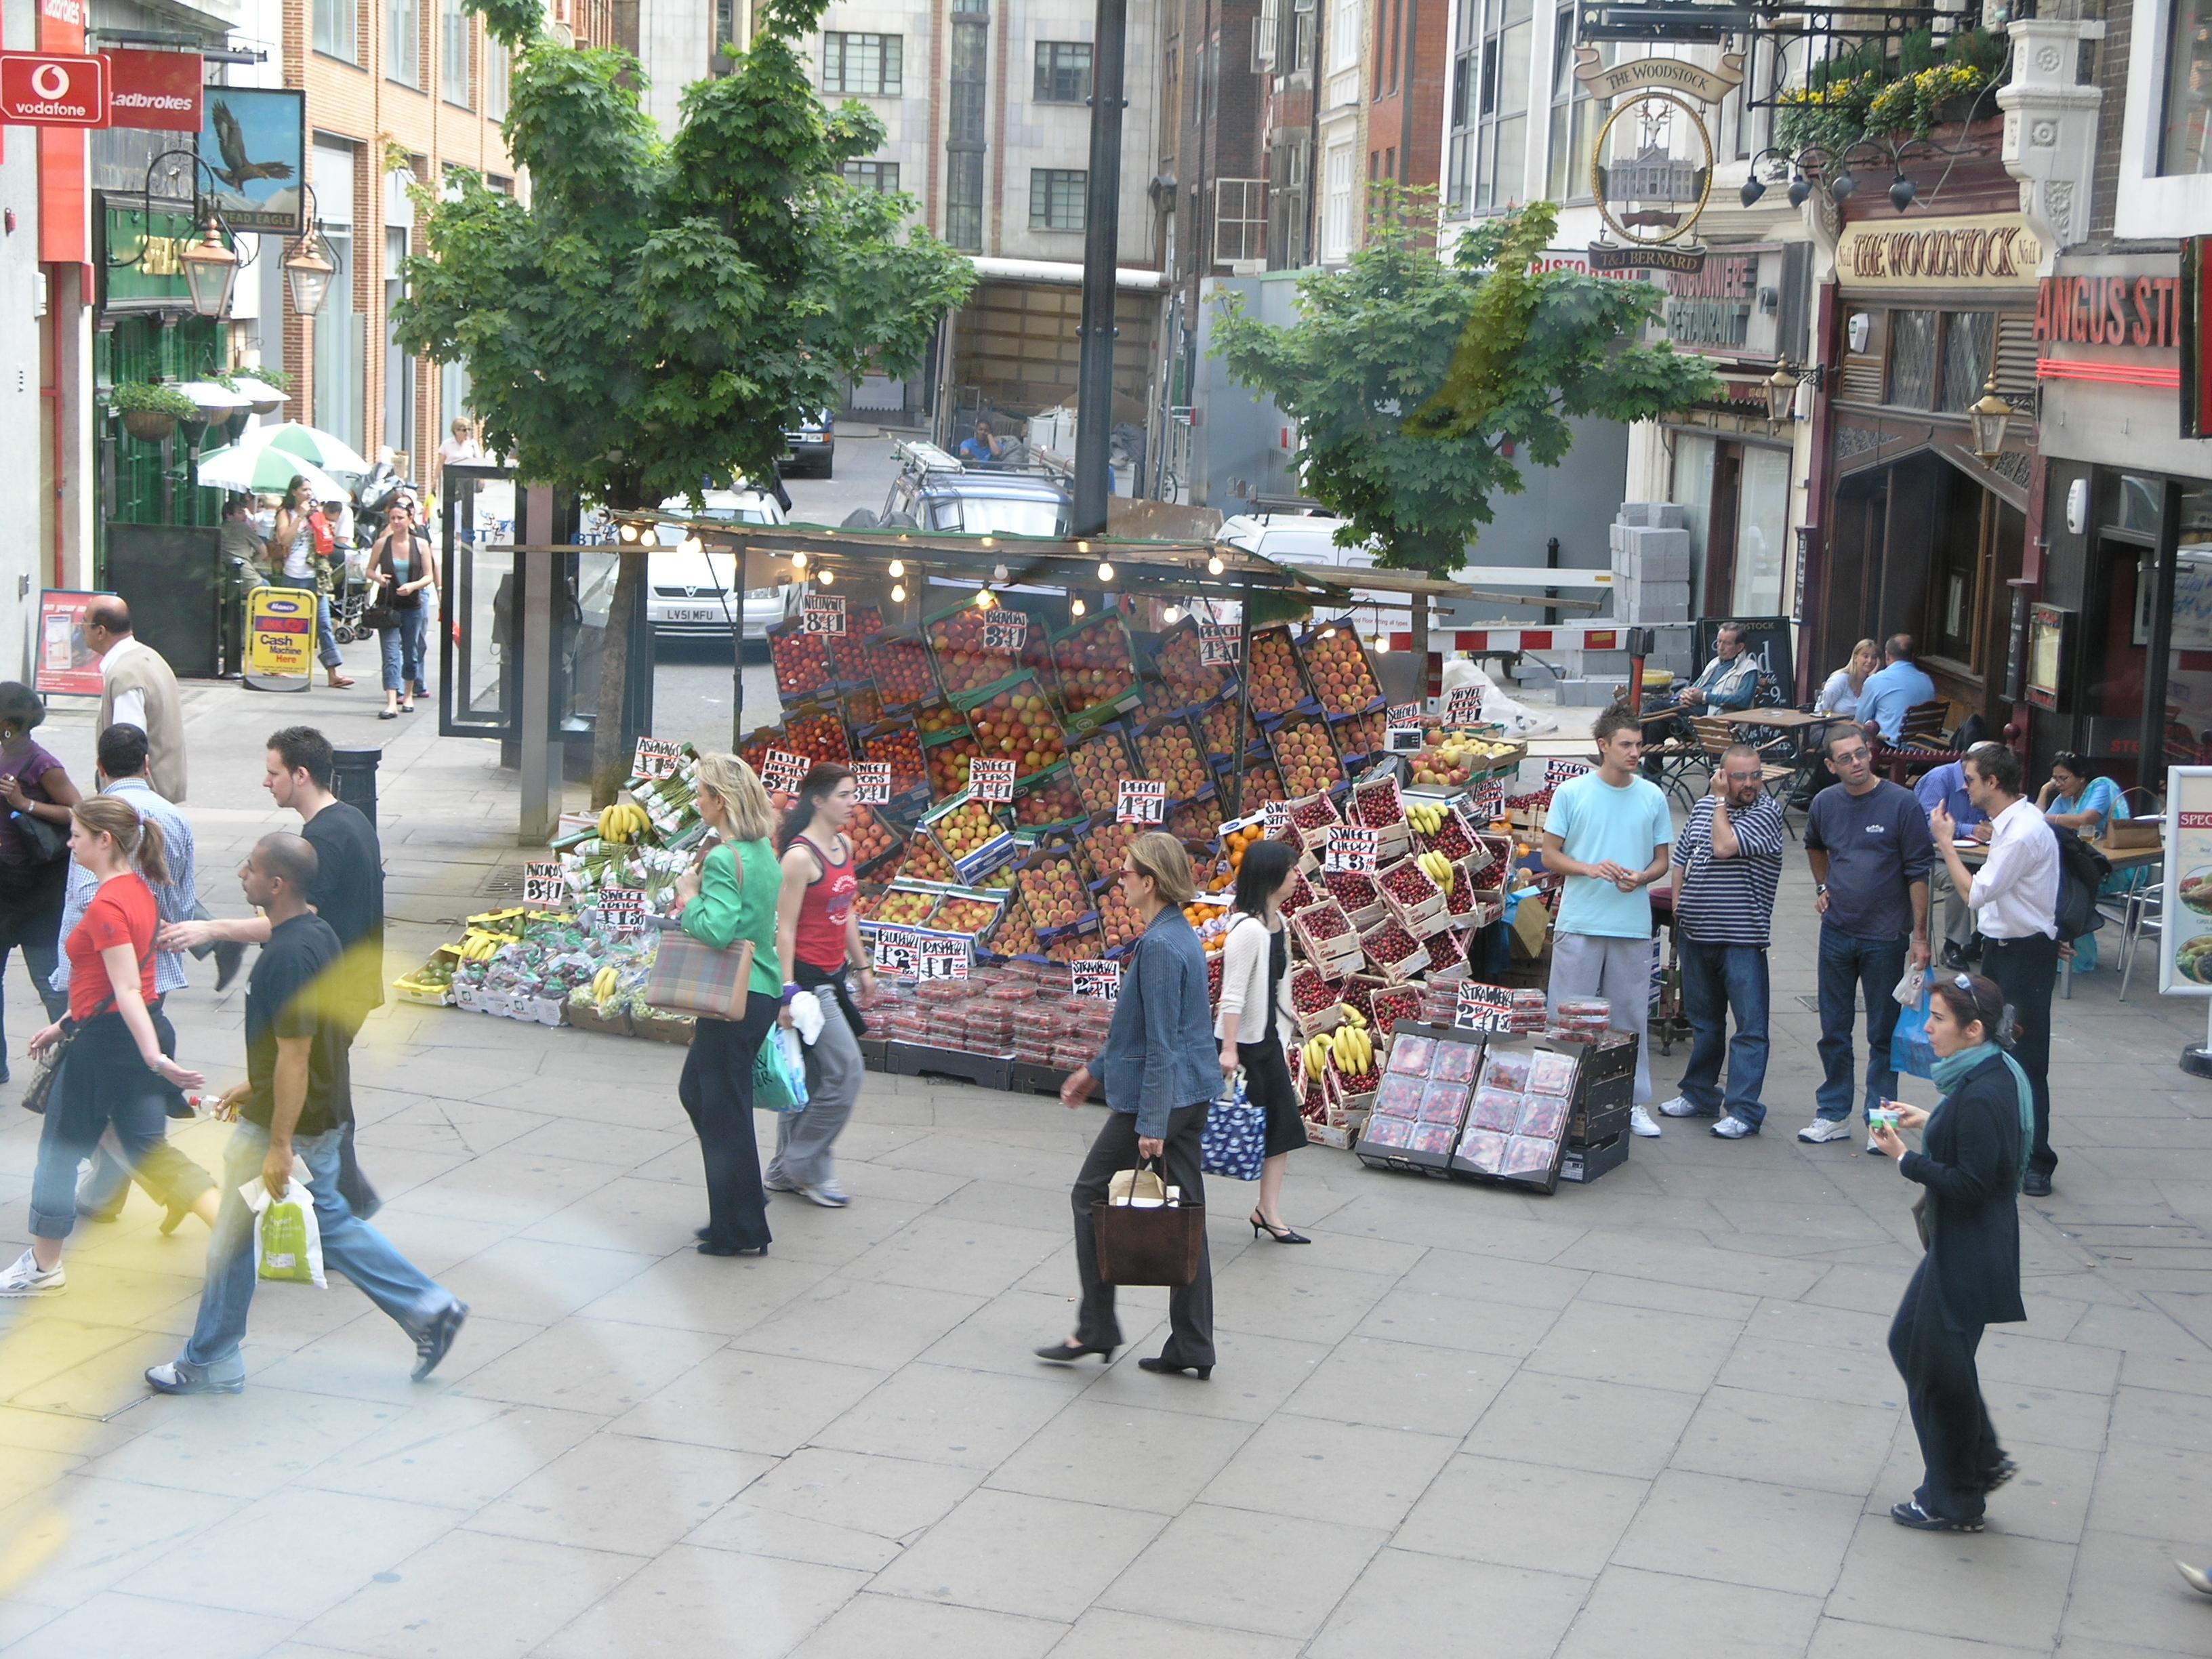 london may 2005-079.jpg